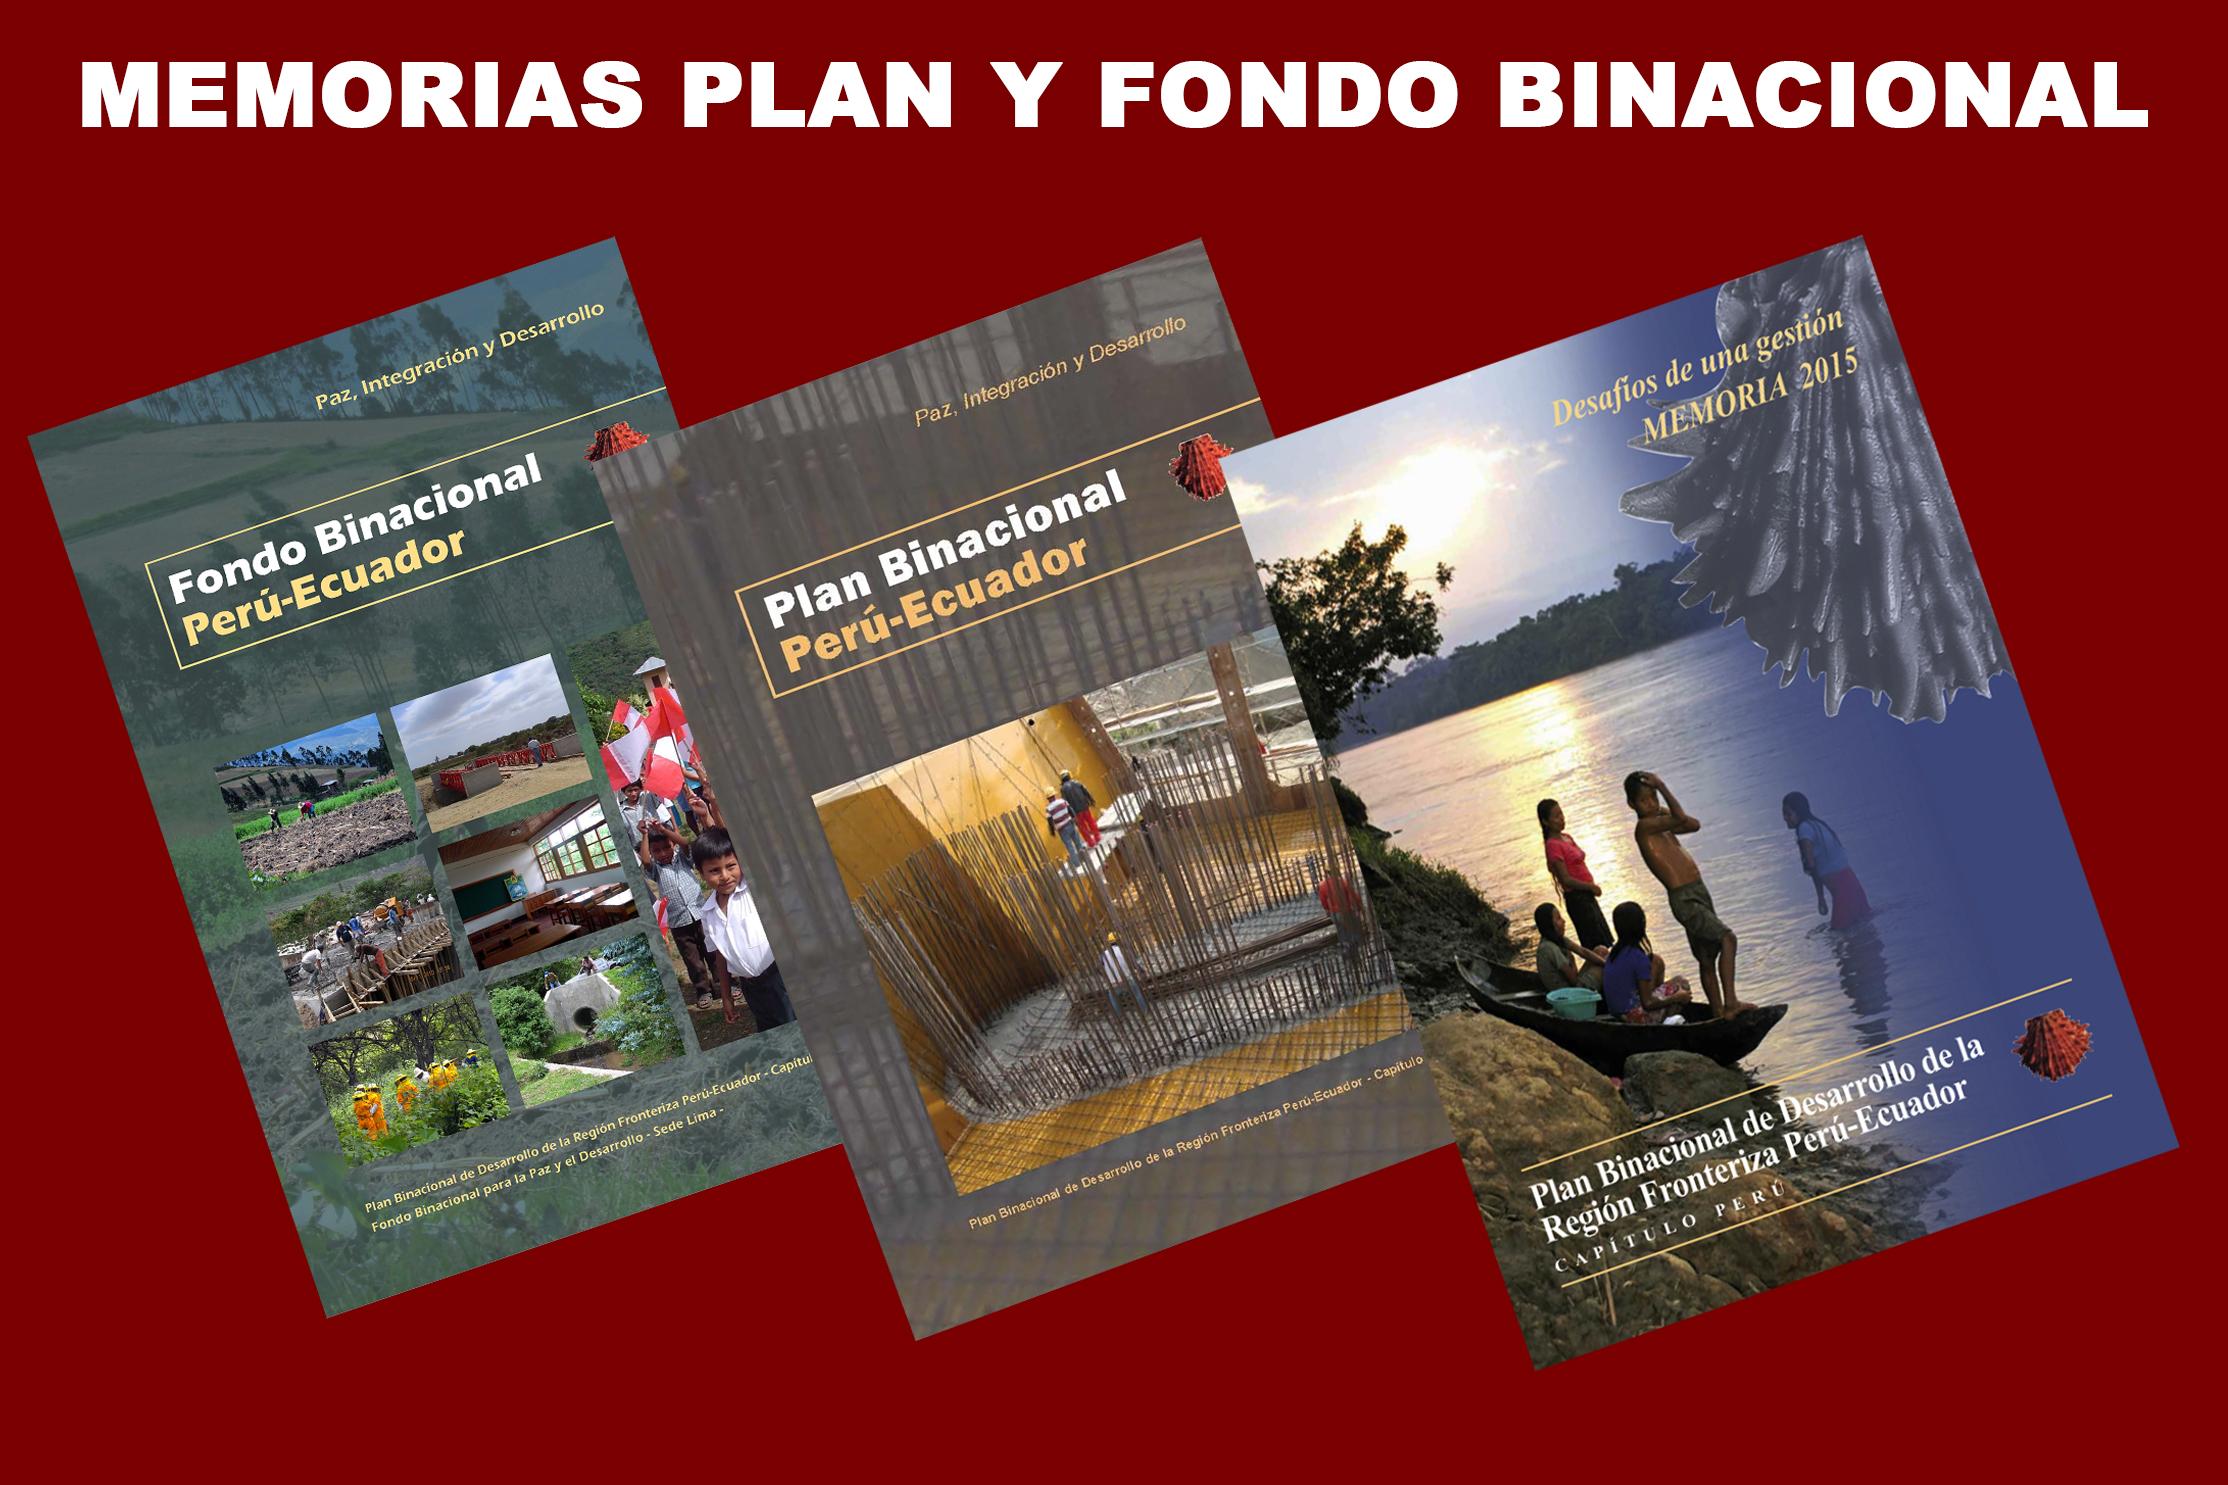 Memorias Plan Binacional